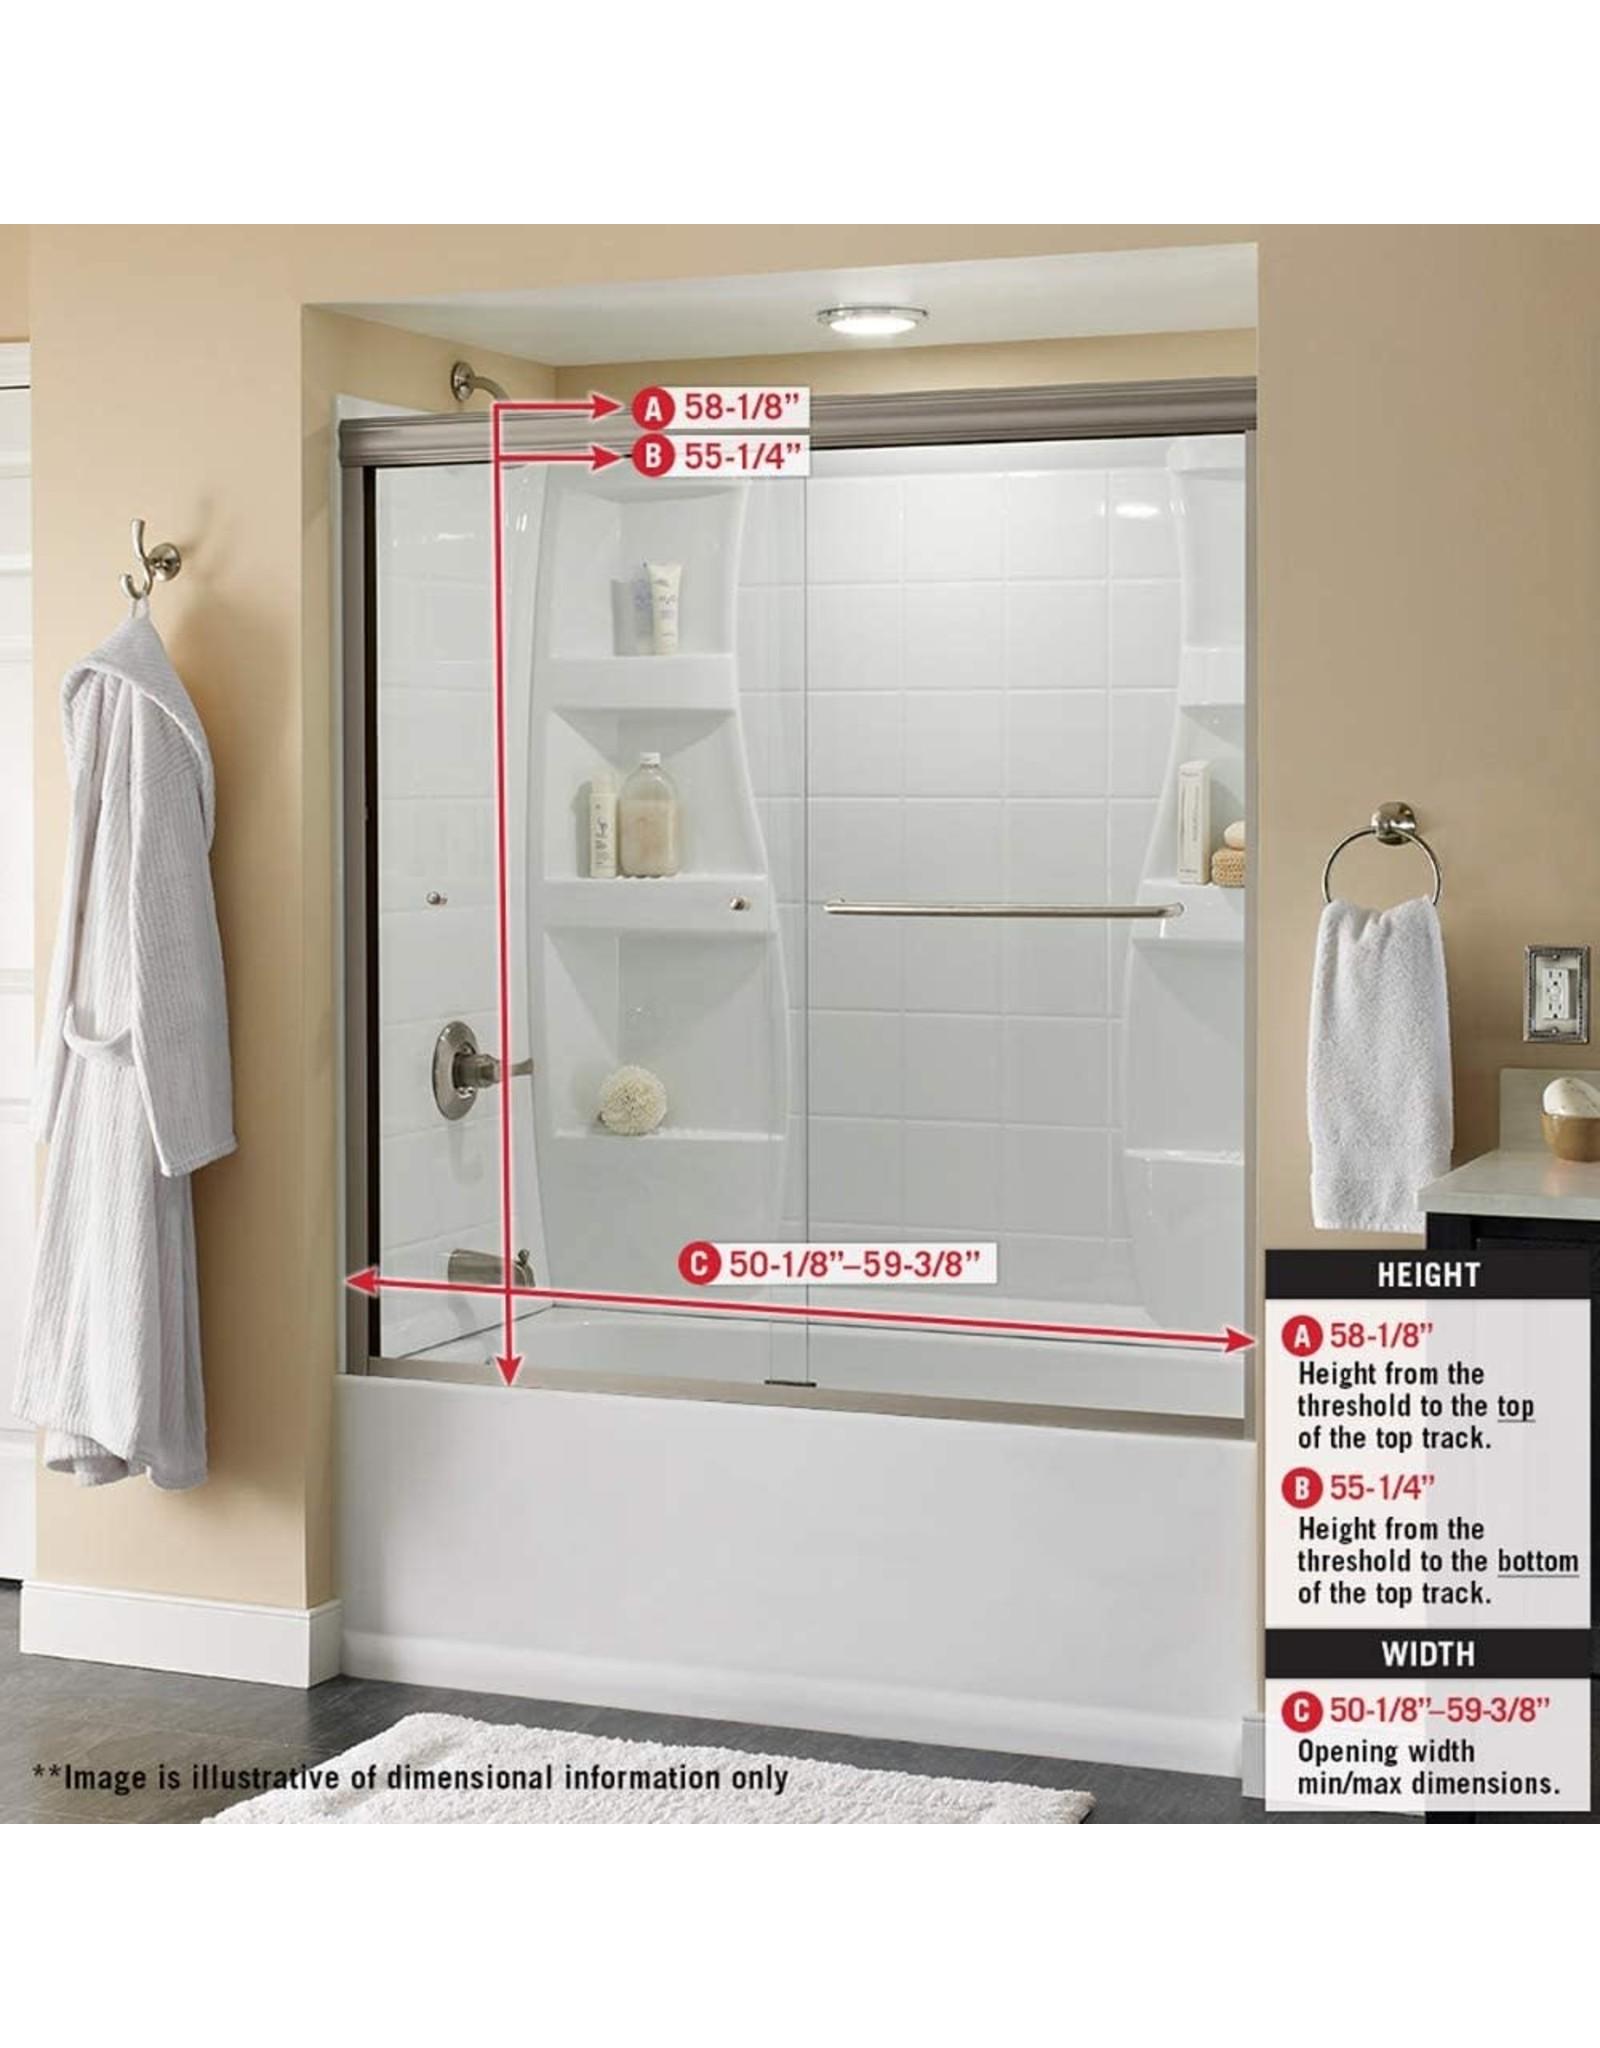 "Delta Shower Doors Delta Shower Doors SD3927420 Classic Semi-Frameless Traditional Sliding Bathtub 60"" x58-1/8, Bronze Track"